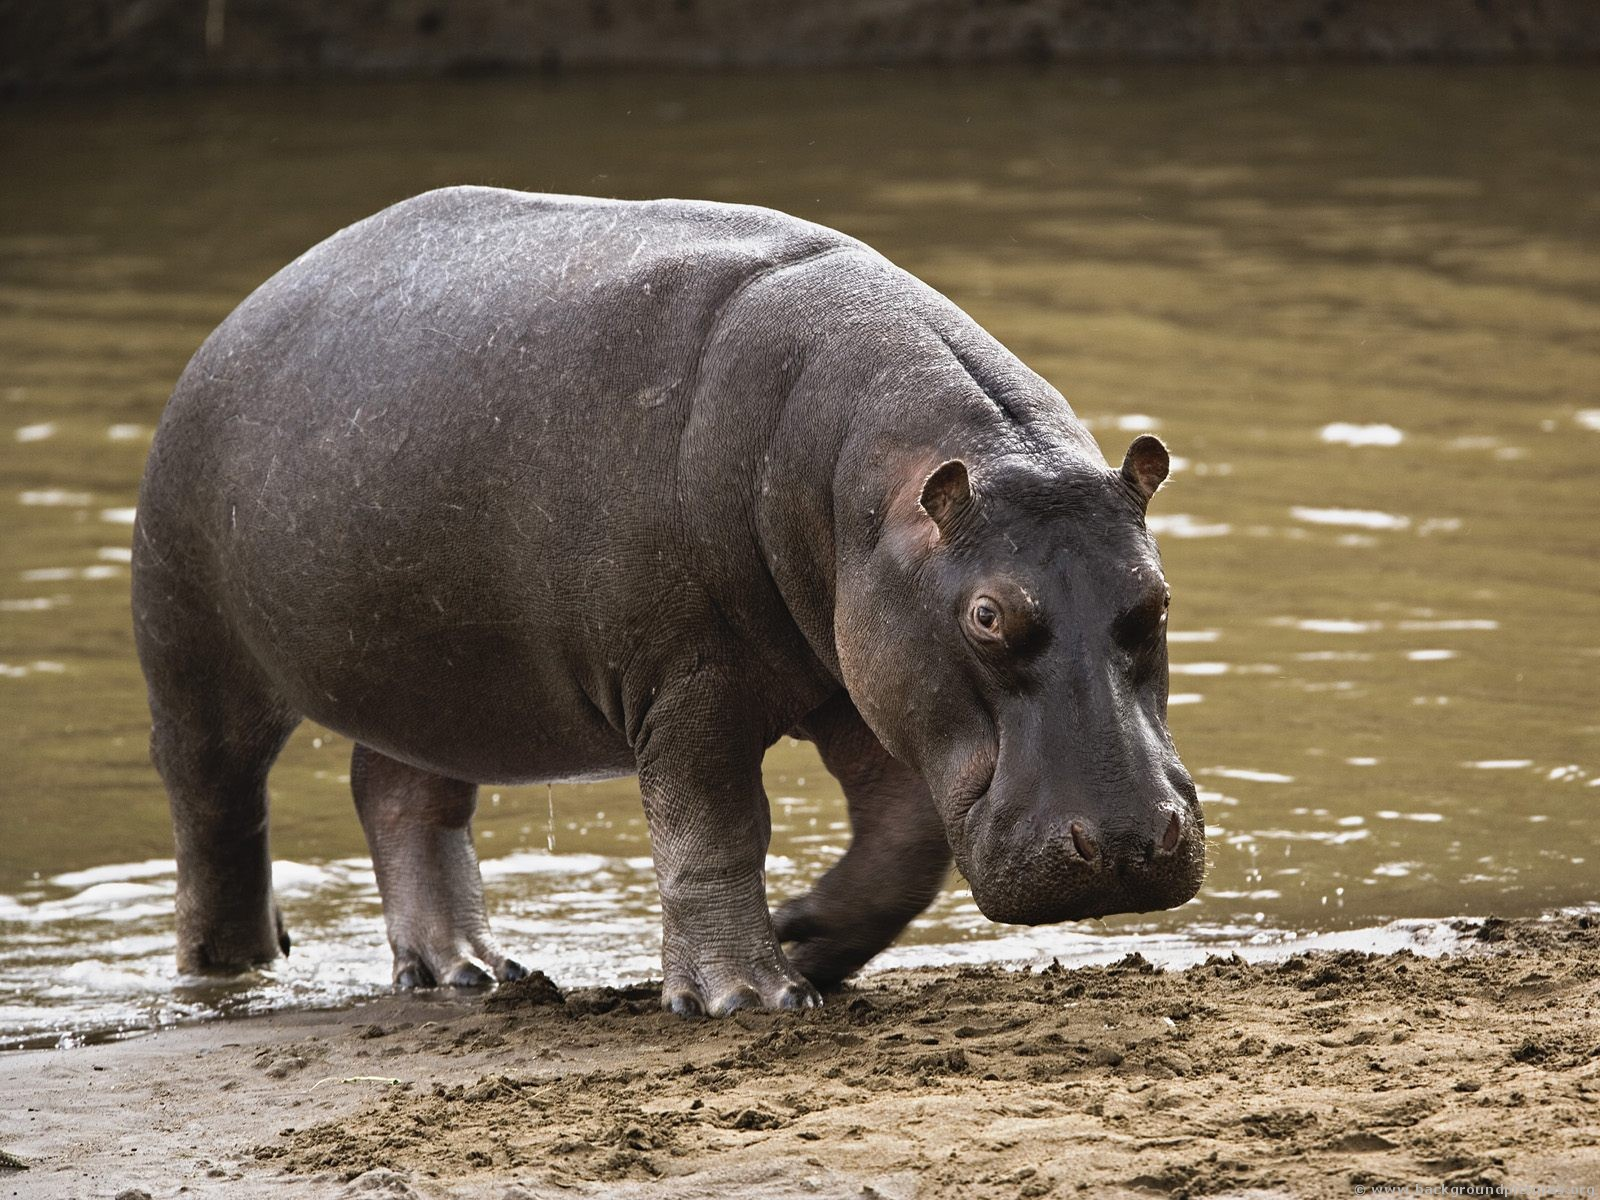 http://1.bp.blogspot.com/-vxWY-vhV6e8/TqQ3JQP2P-I/AAAAAAAABuI/TGY8kyTeEiY/s1600/Hippopotamus.jpg